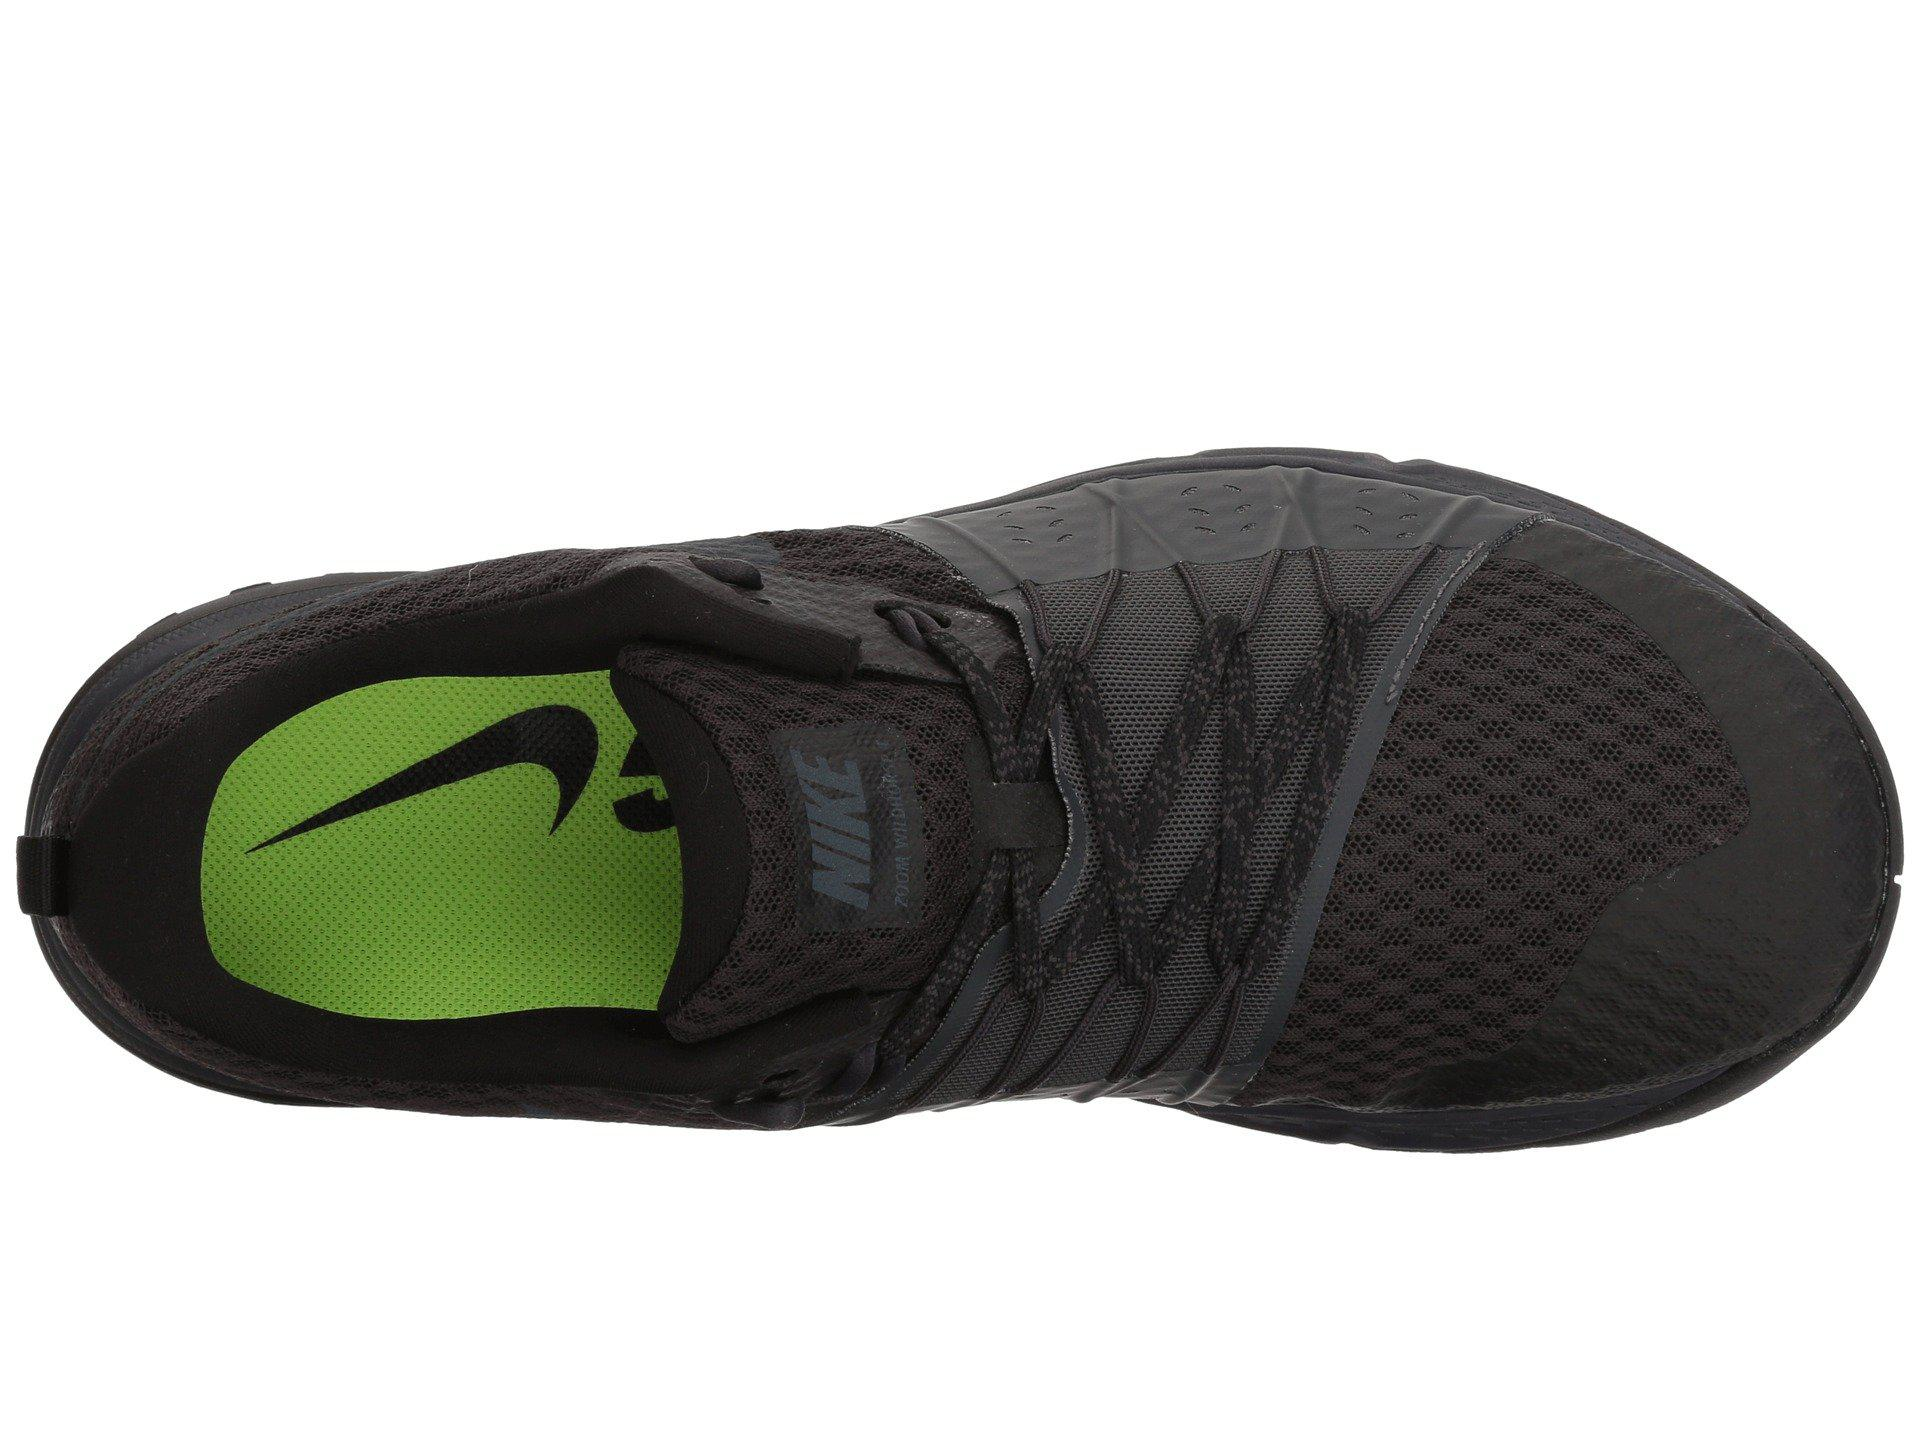 50bf2d66eb0 Lyst - Nike Air Zoom Wildhorse 4 (black anthracite anthracite) Men s ...